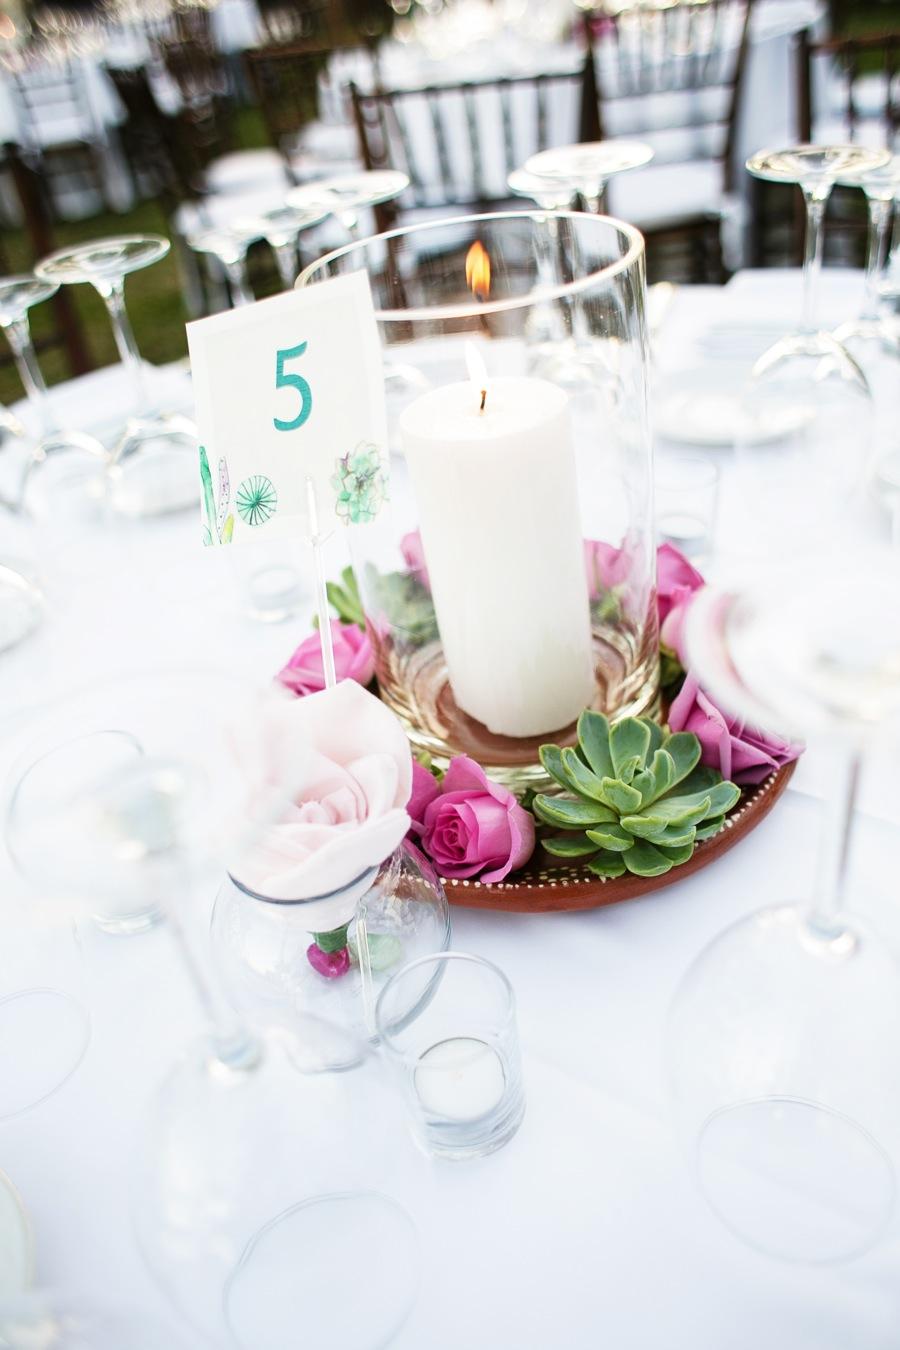 Blue Rose Wedding Centerpieces - Weddings Gallery